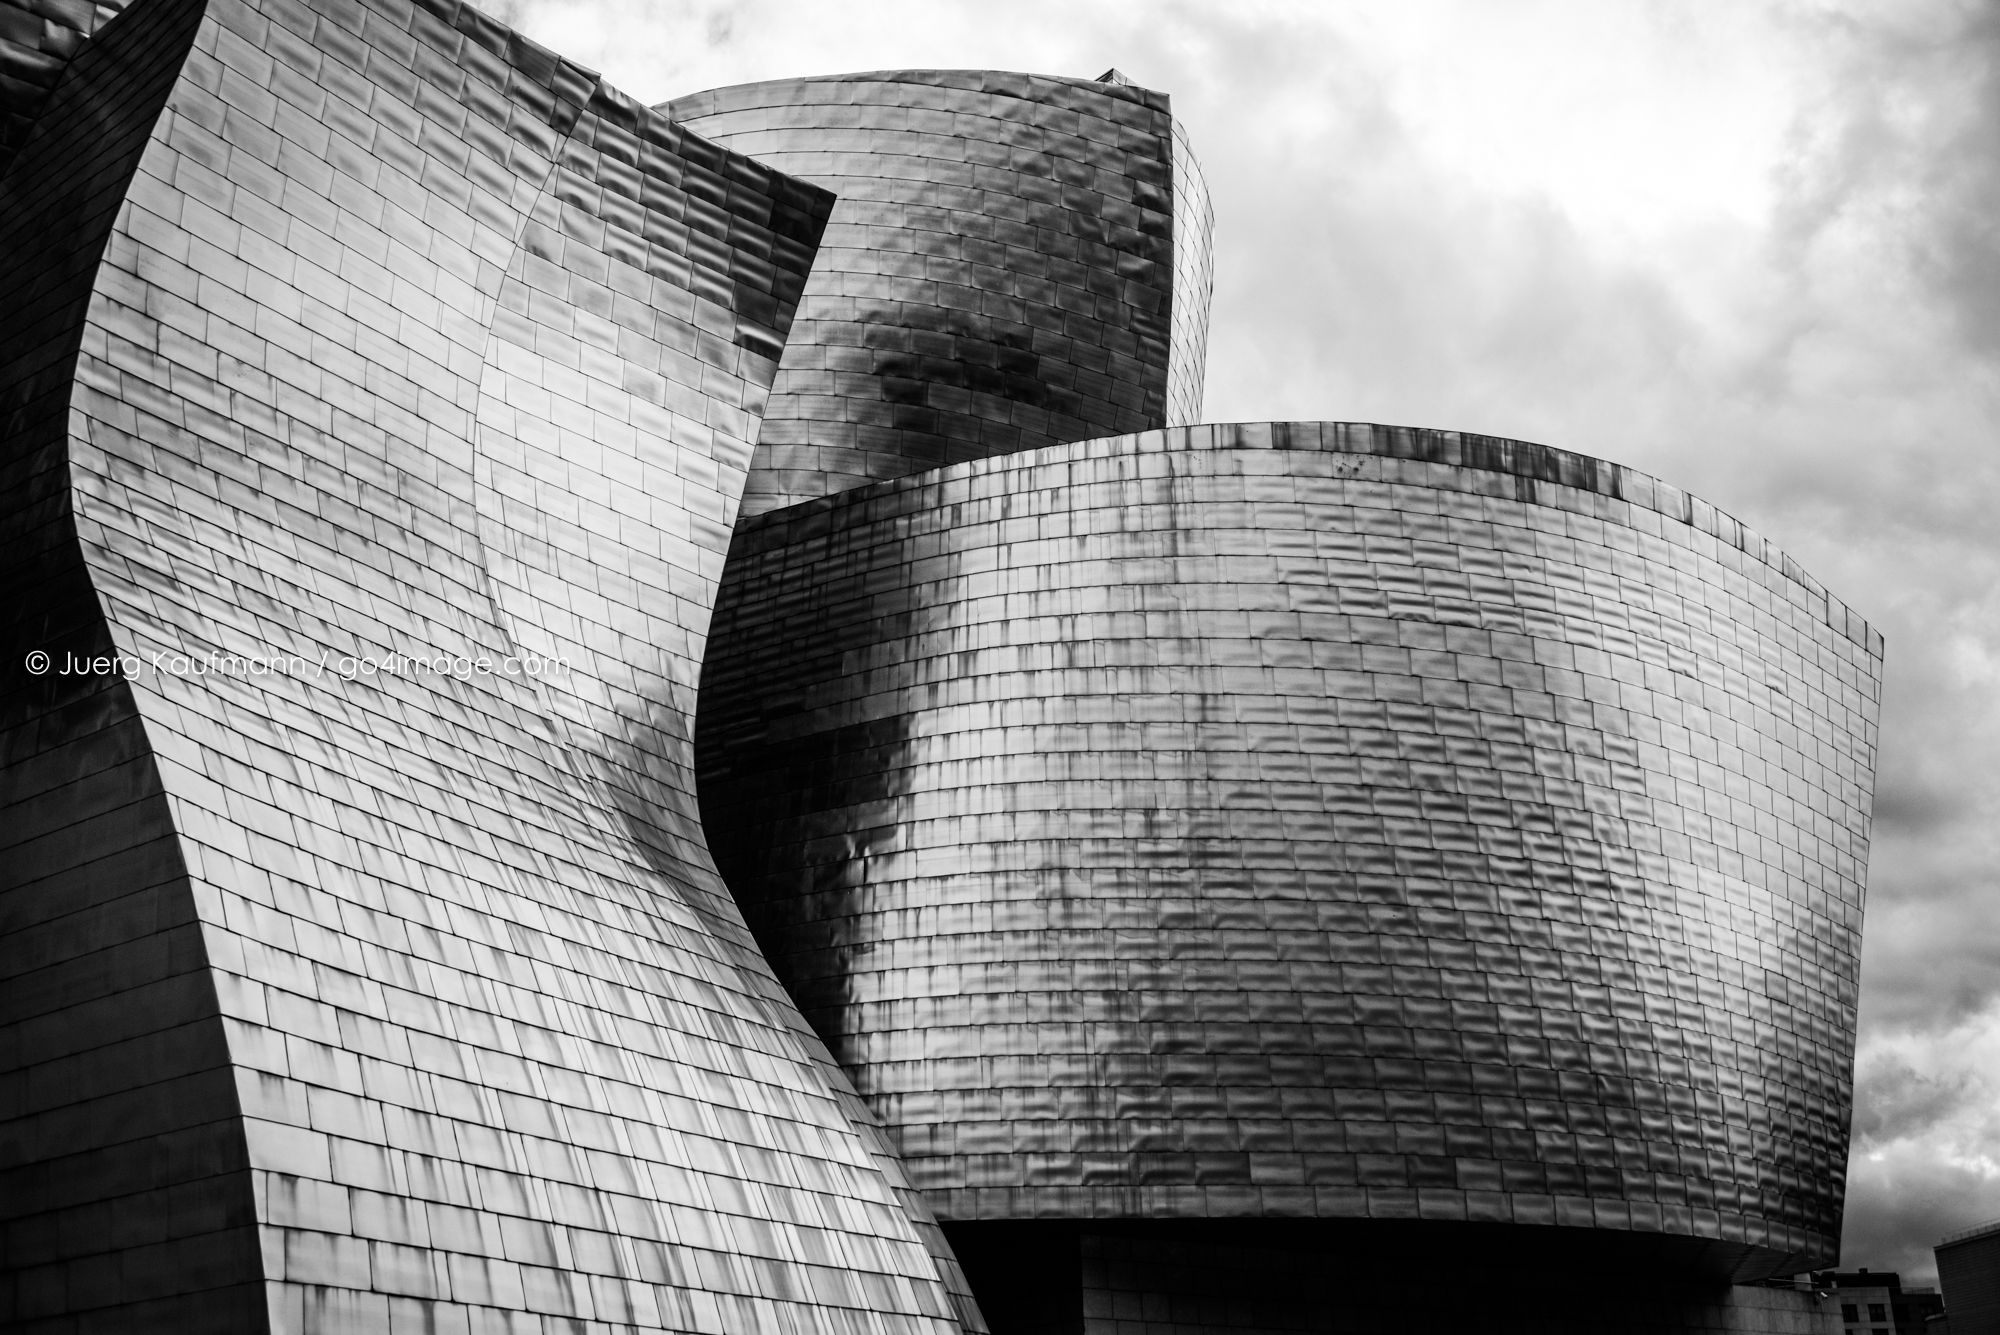 Sapin Bilboa March 1st 2018. Guggenheim Museum Bilbao